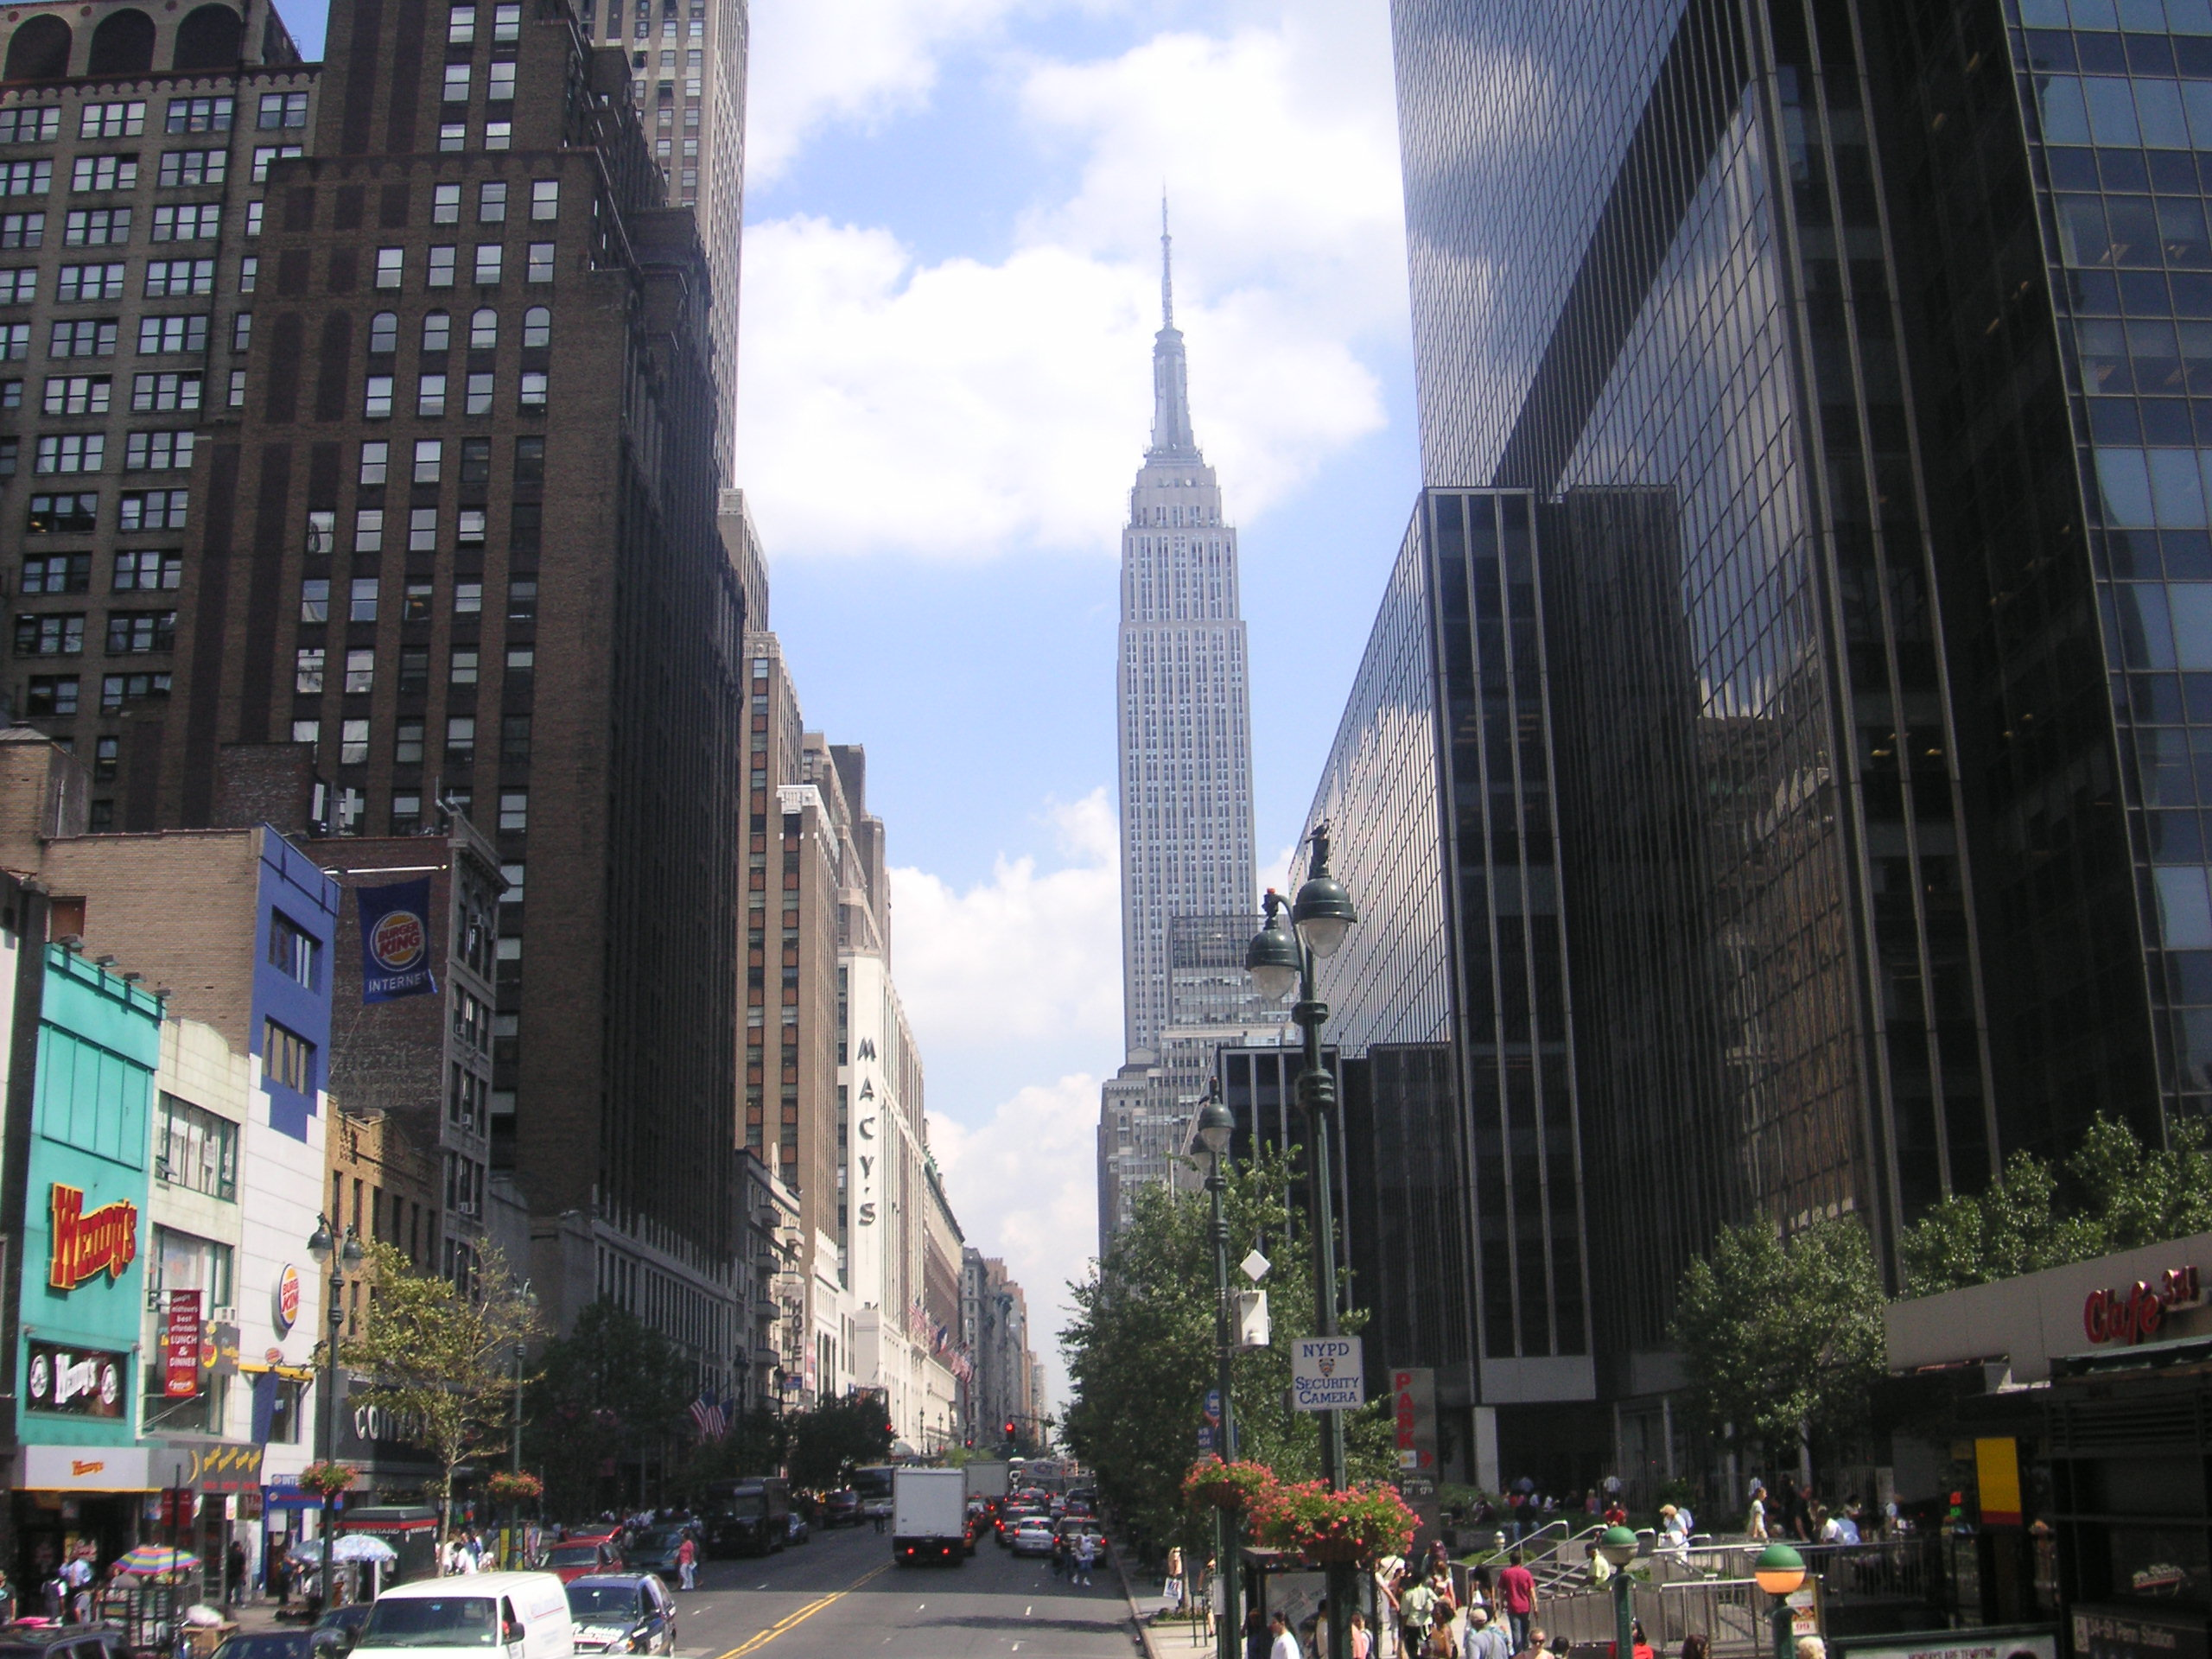 5th_Avenue_&_Empire_State_Building_(8402730093).jpg